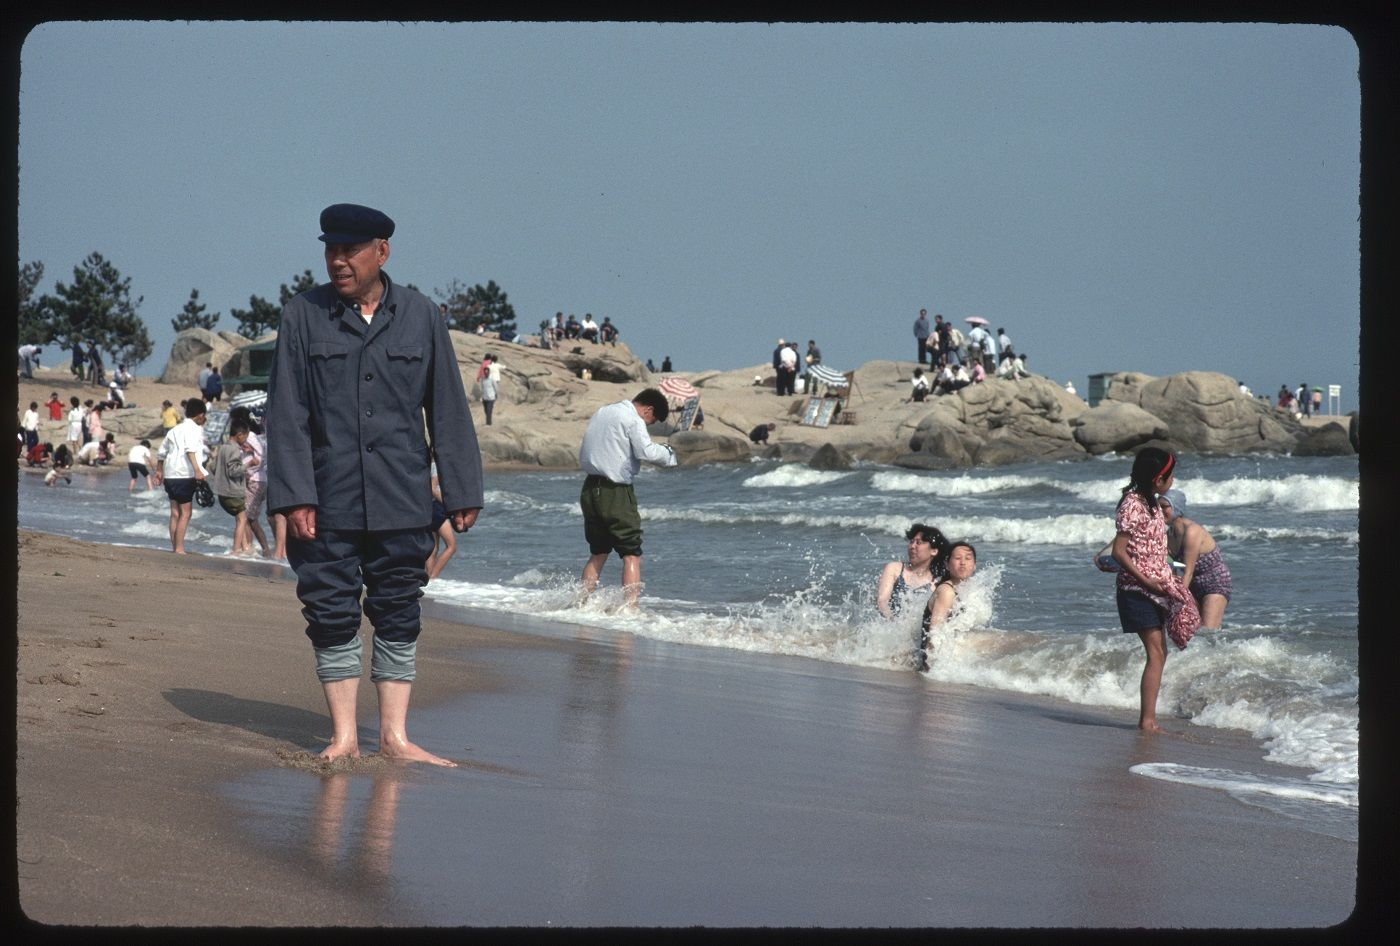 Beachgoers at Beidaihe  (Photo by Dean Conger/Corbis via Getty Images)